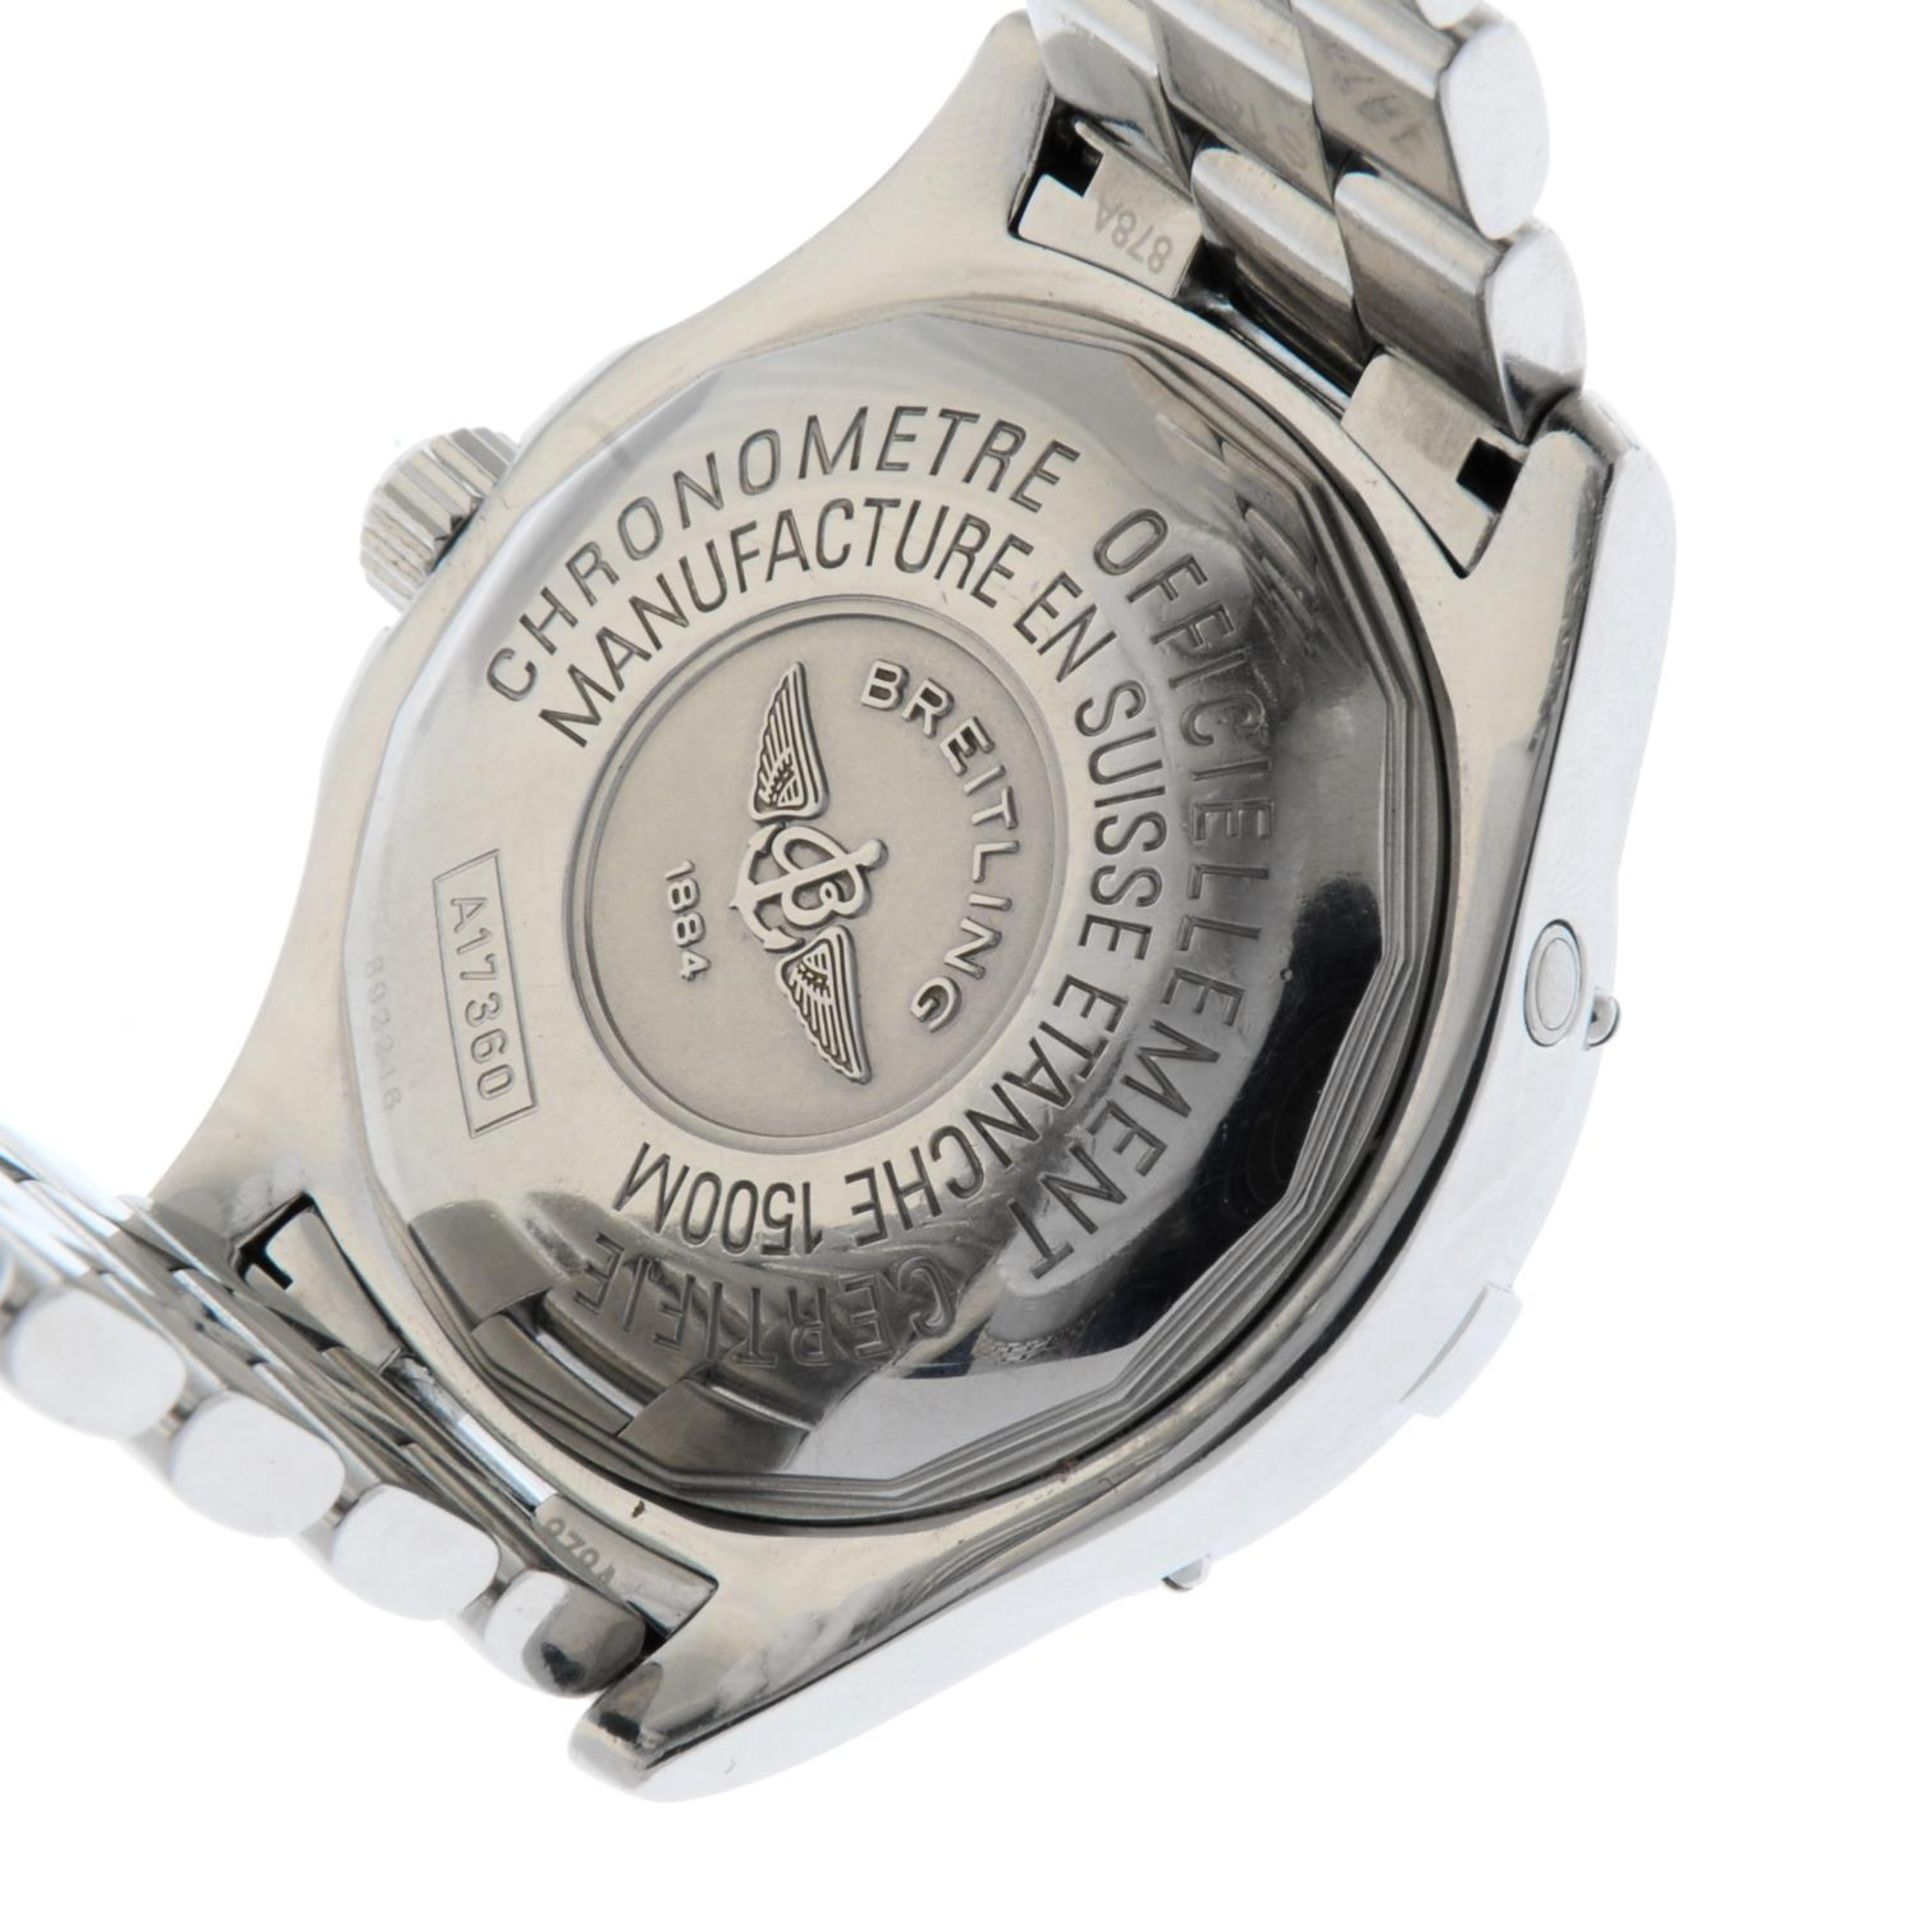 BREITLING - a SuperOcean bracelet watch. - Bild 5 aus 5